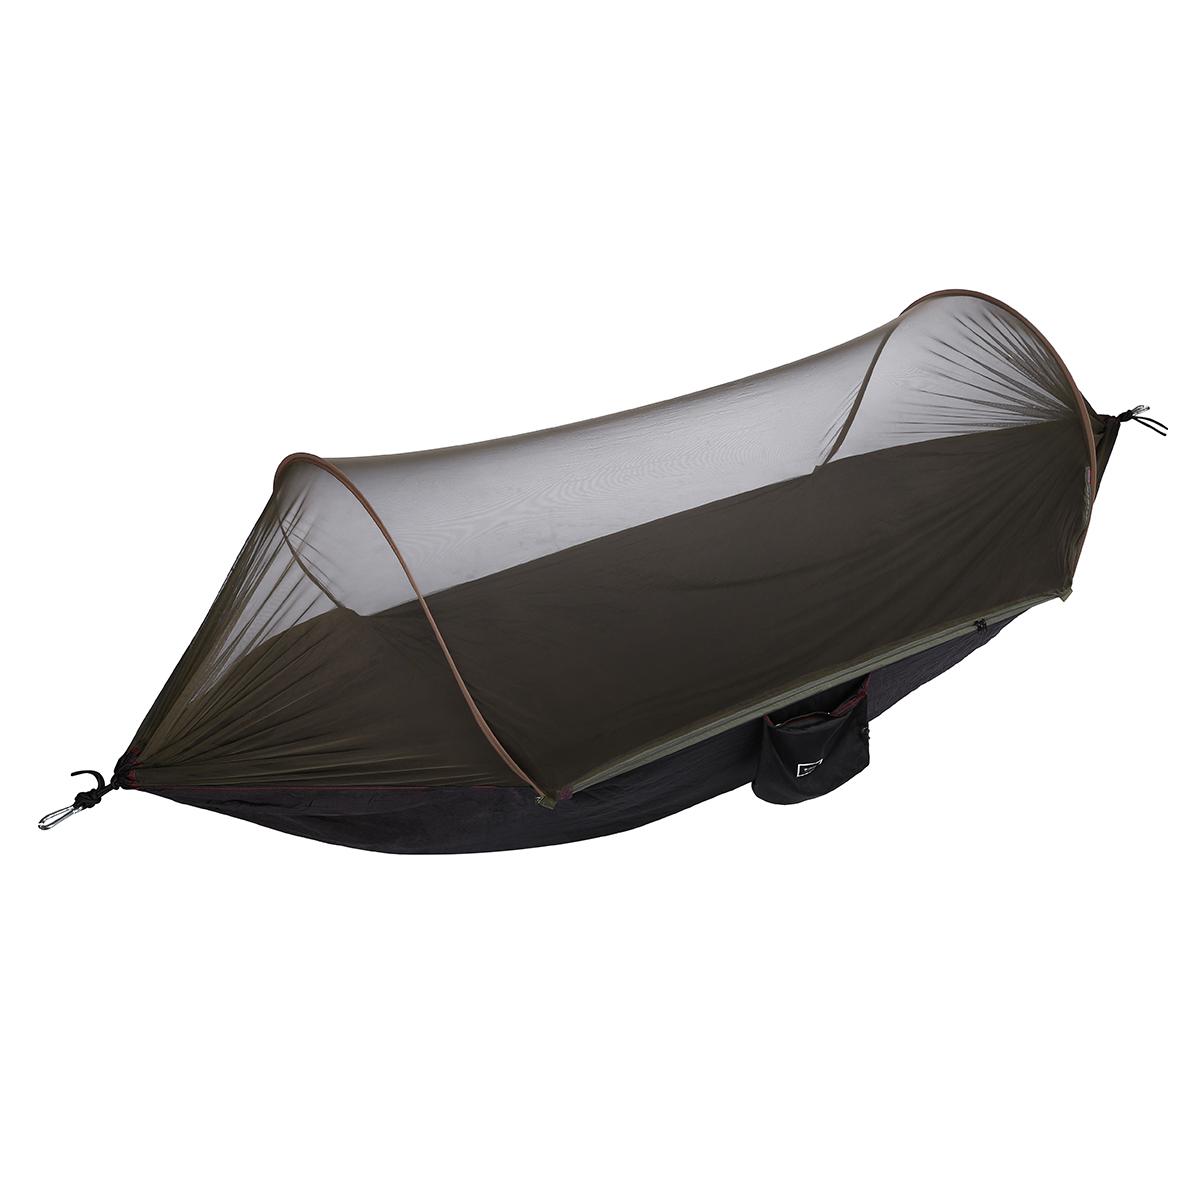 Portable Mosquito Netting : Mosquito net hammock camping portable hiking sleeping bug